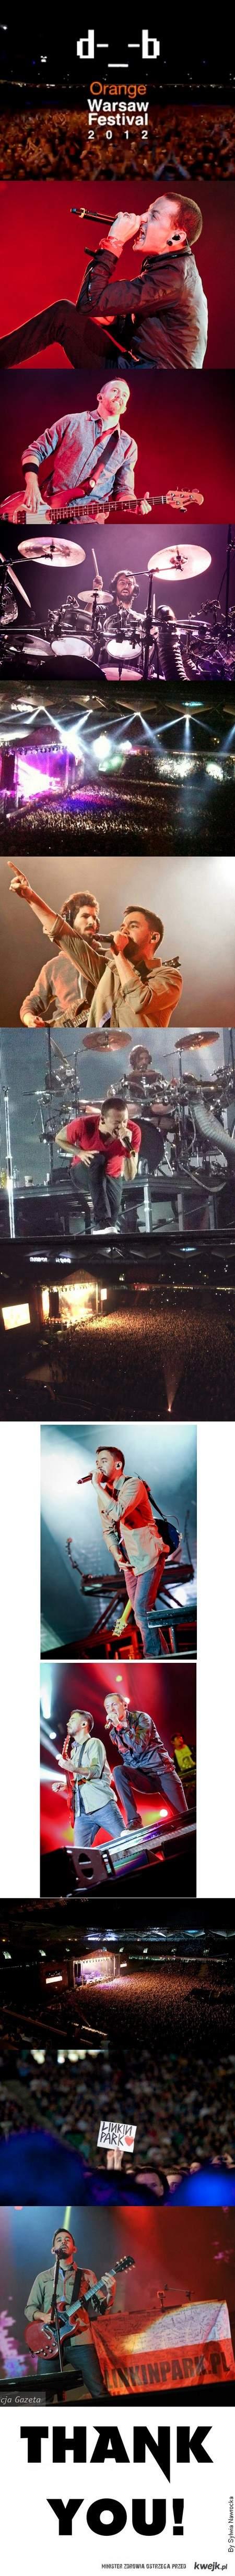 Linkin Park Pepsi Arena 2012